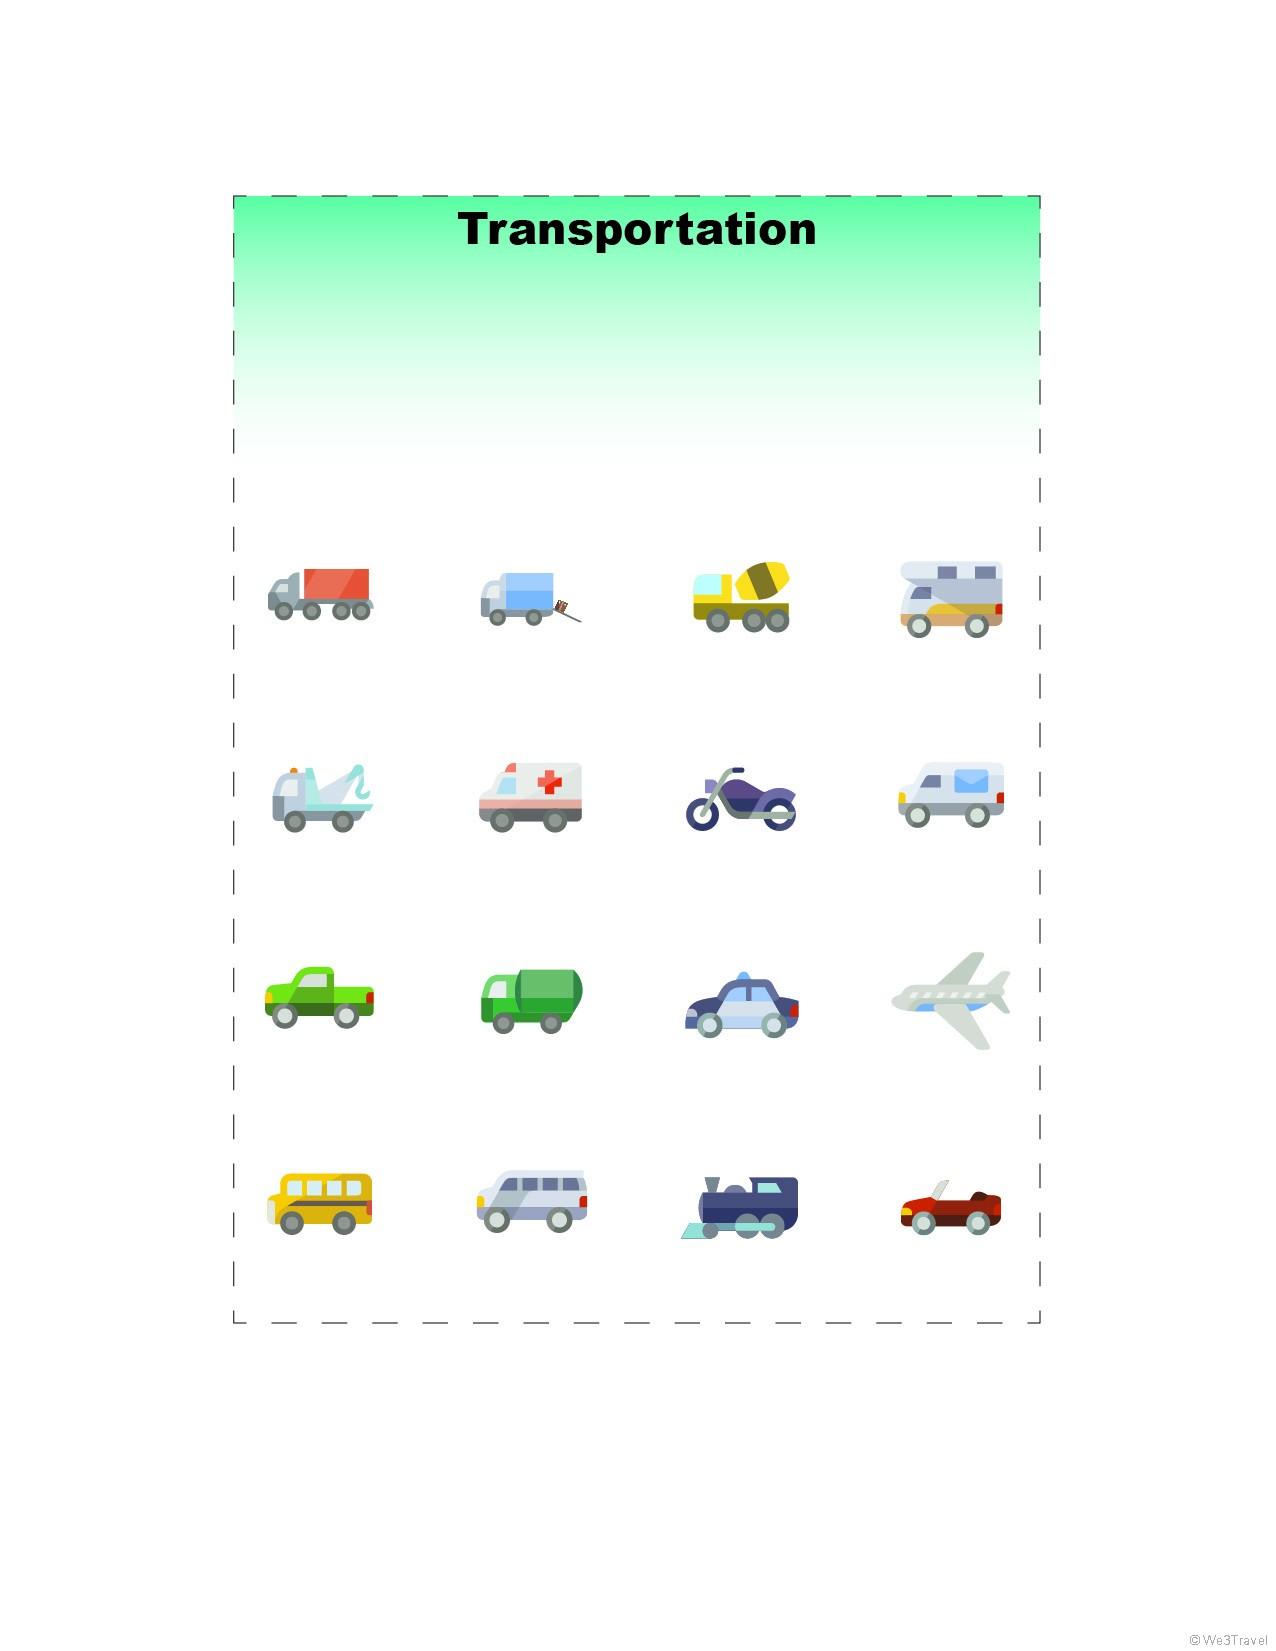 5 Free Road Trip Bingo Printables For Kids - We3Travel Blog